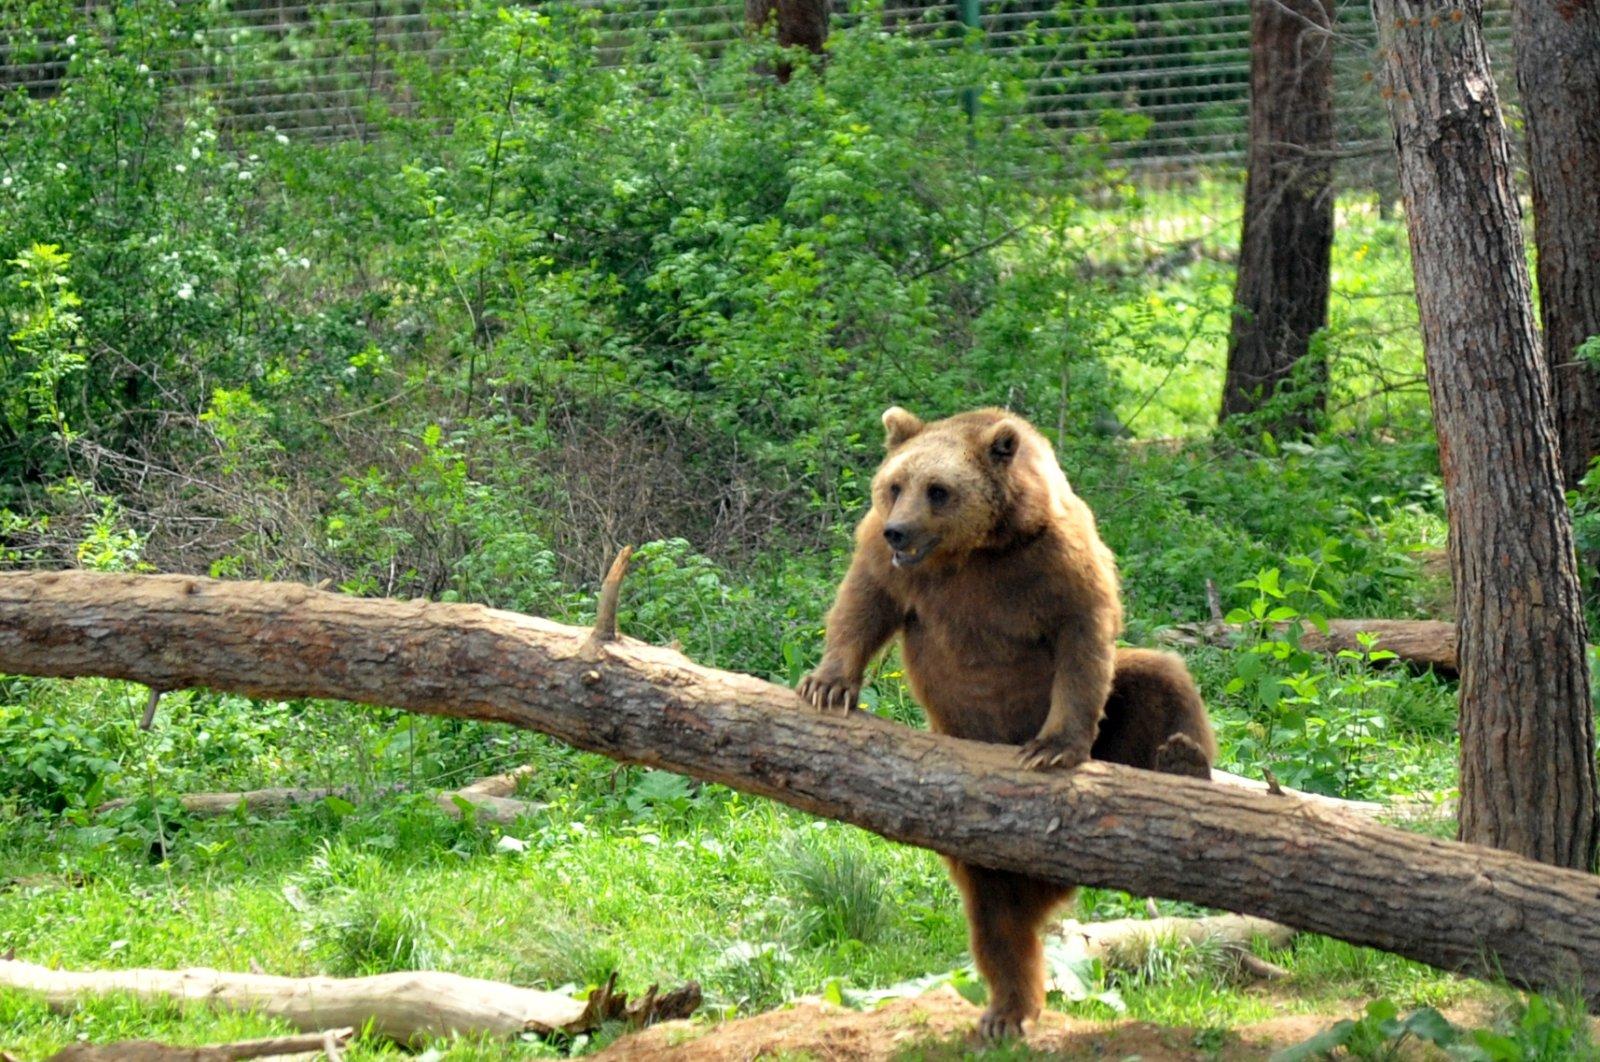 A bear climbs up a timber at a shelter for wild animals in Bursa, northwestern Turkey, Jun. 1, 2021. (DHA PHOTO)